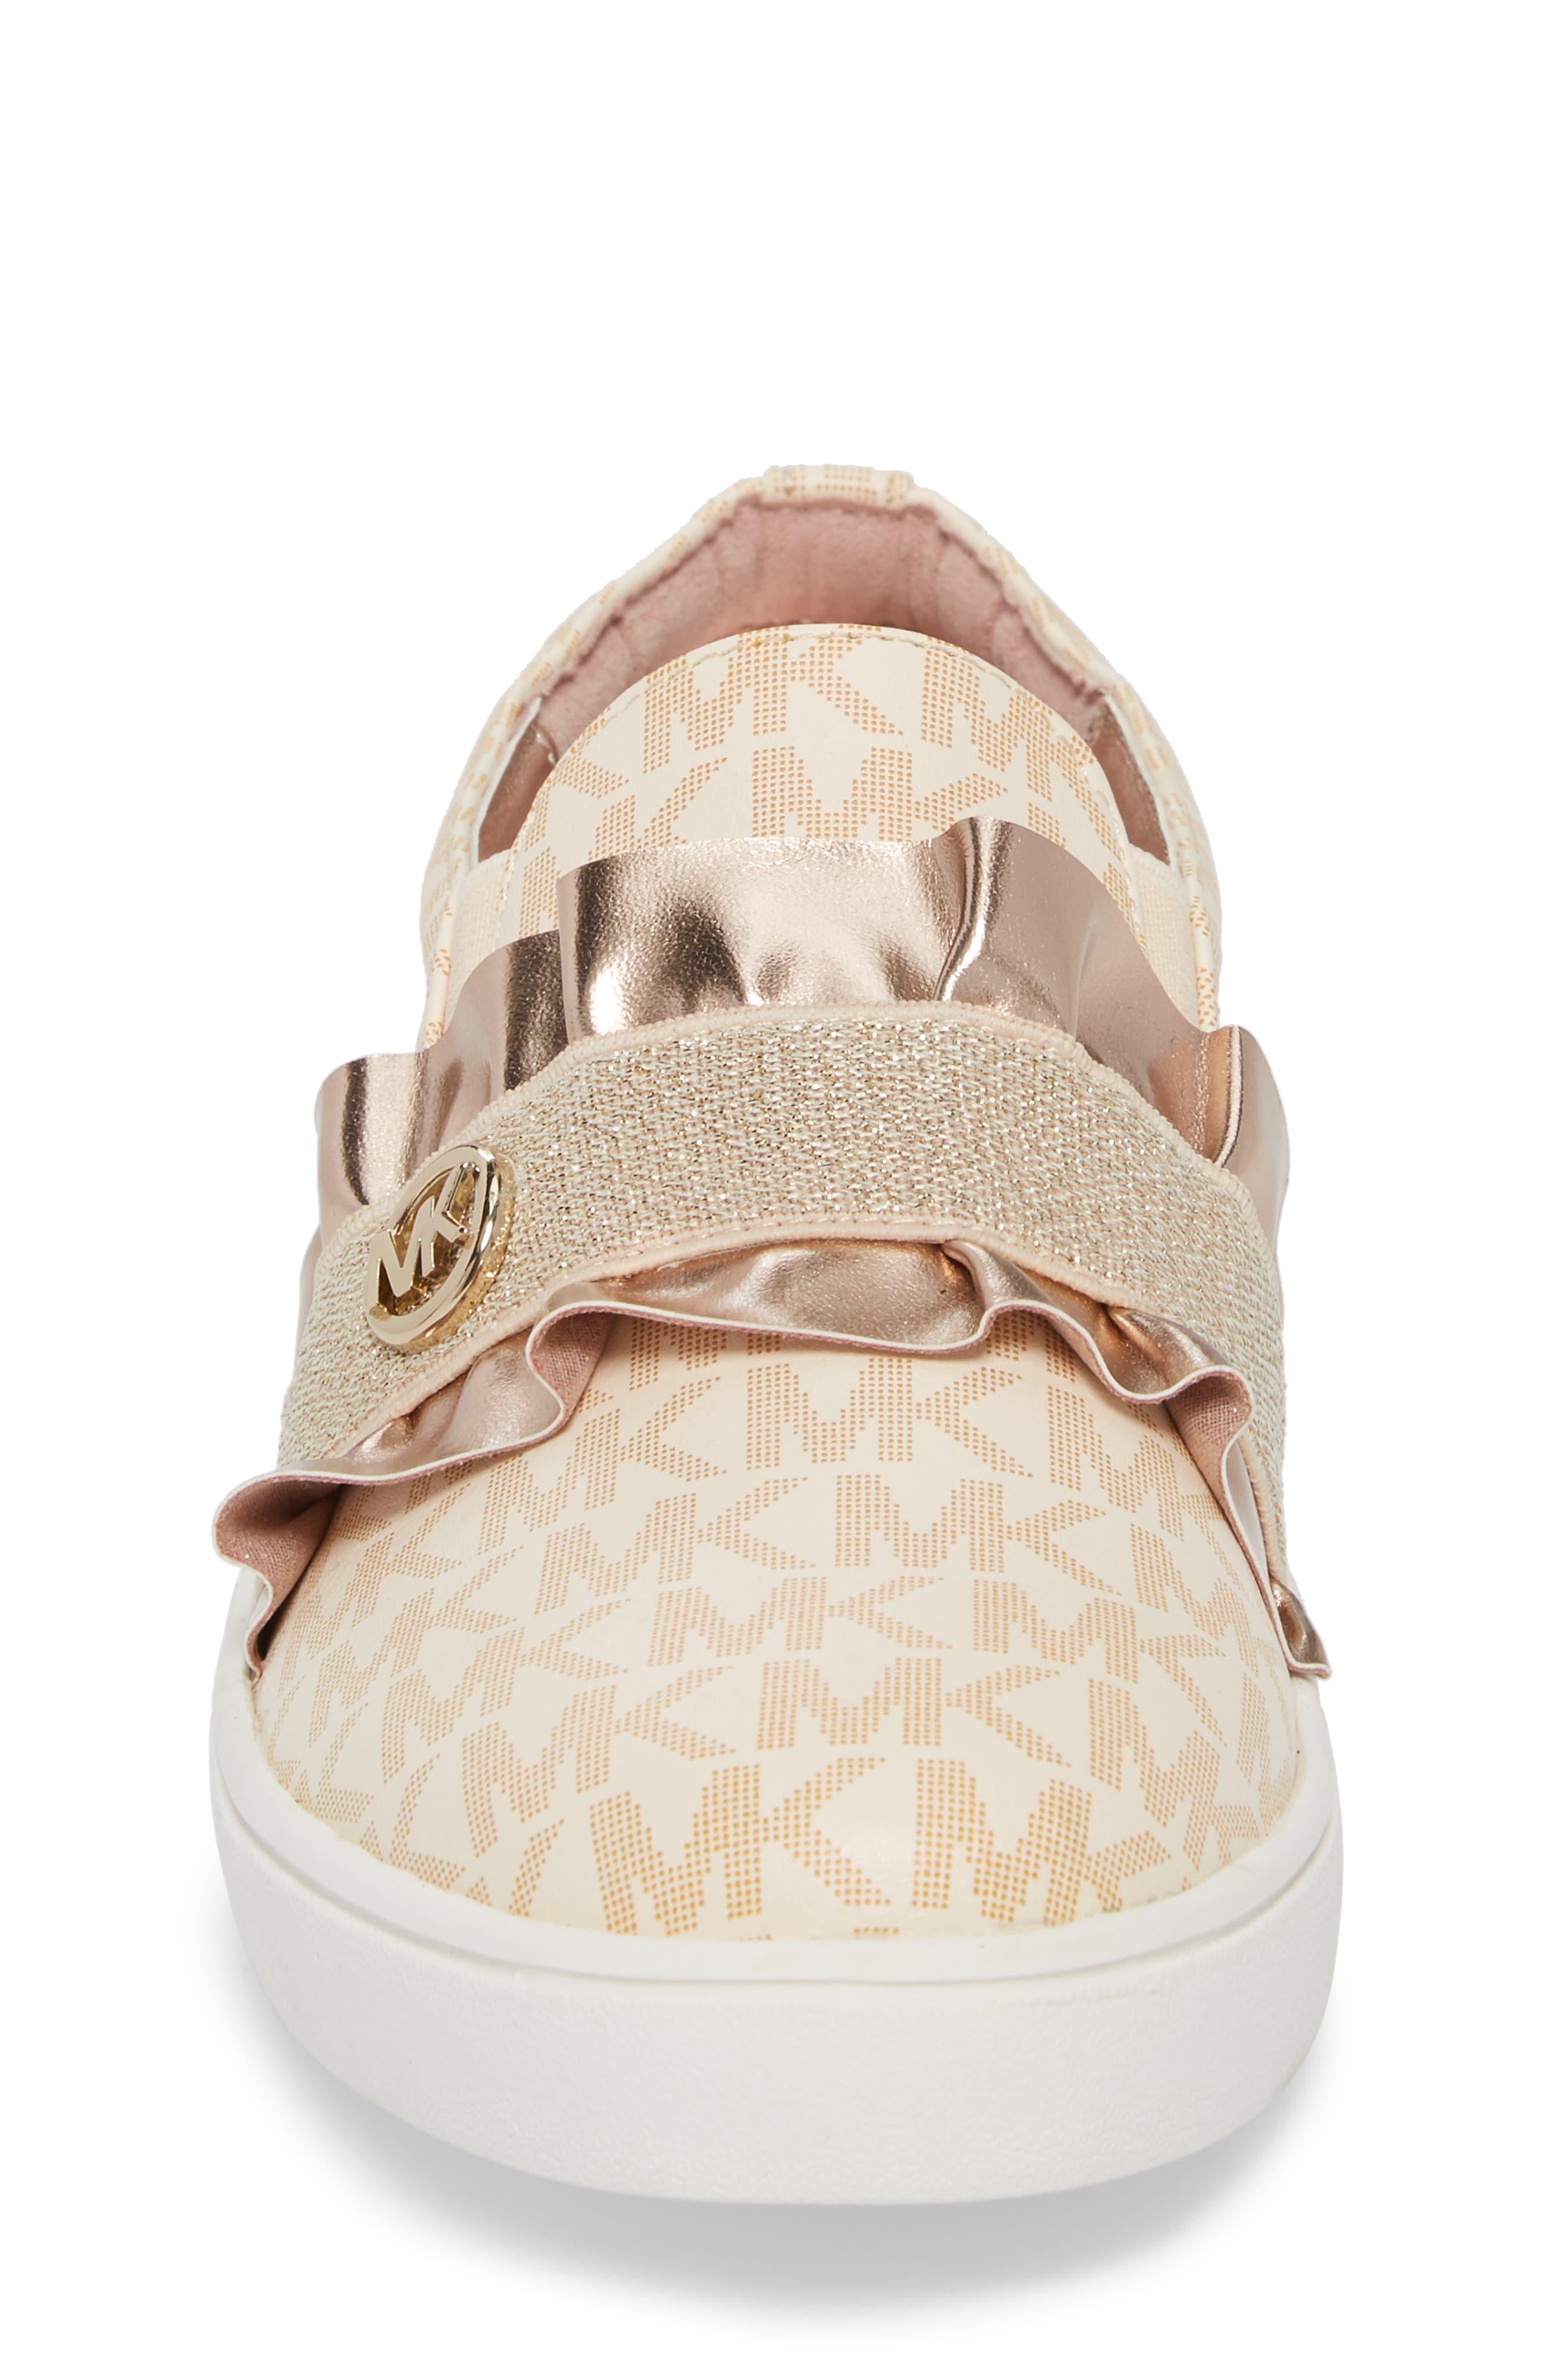 Ivy Riff Ruffle Sneaker,                             Alternate thumbnail 4, color,                             Rose Gold